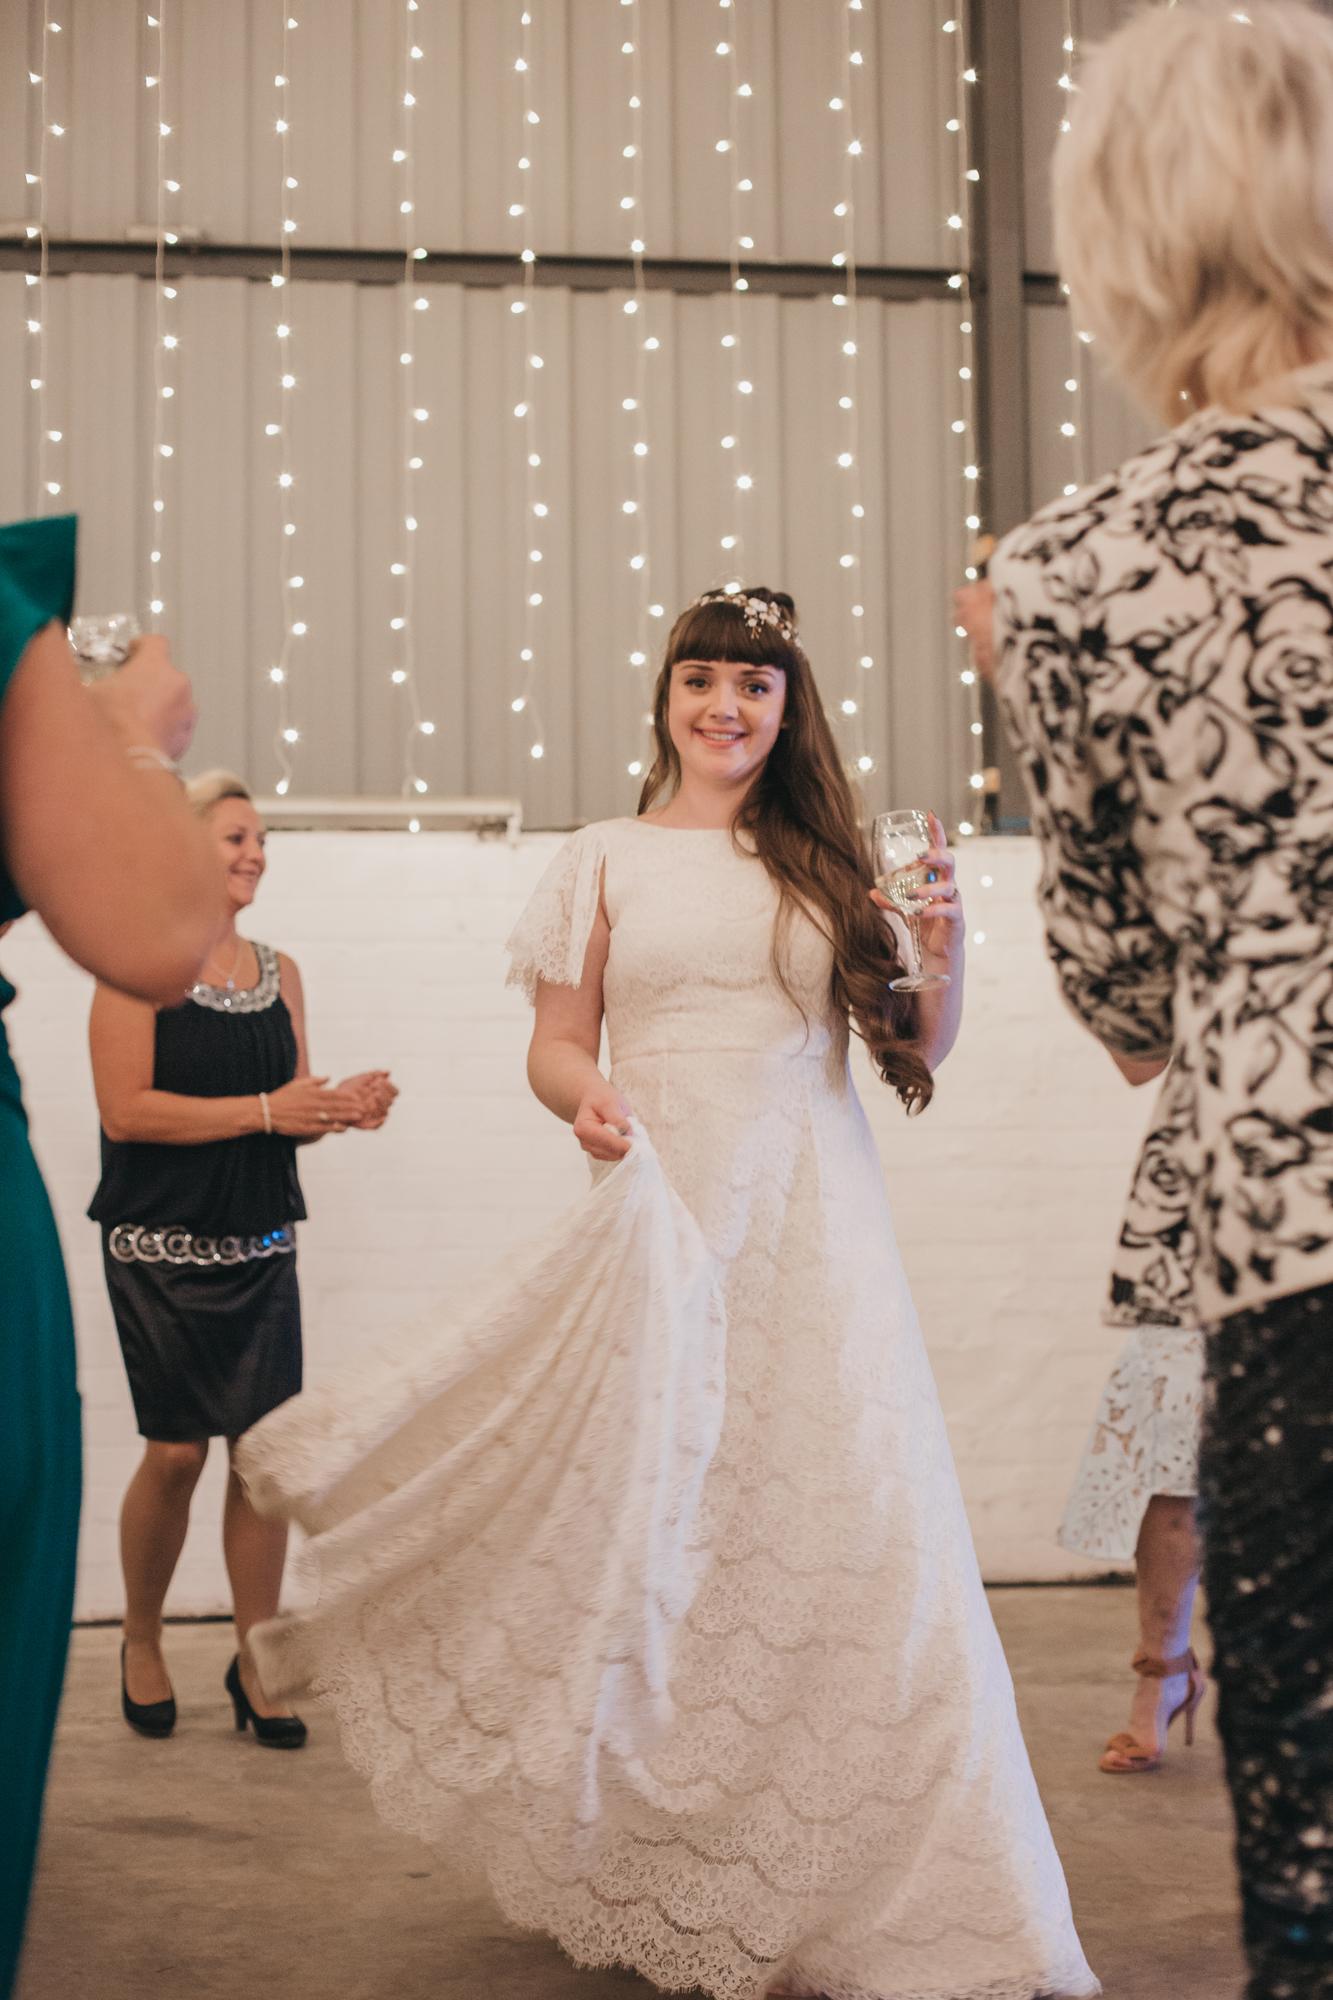 Kristy-Back-Garden-Outdoor-Wedding-Sheffield-Industrial-Warehouse-Wedding-Bohemian-Kate-Beaumont-Dahlia-Dress-52.jpg